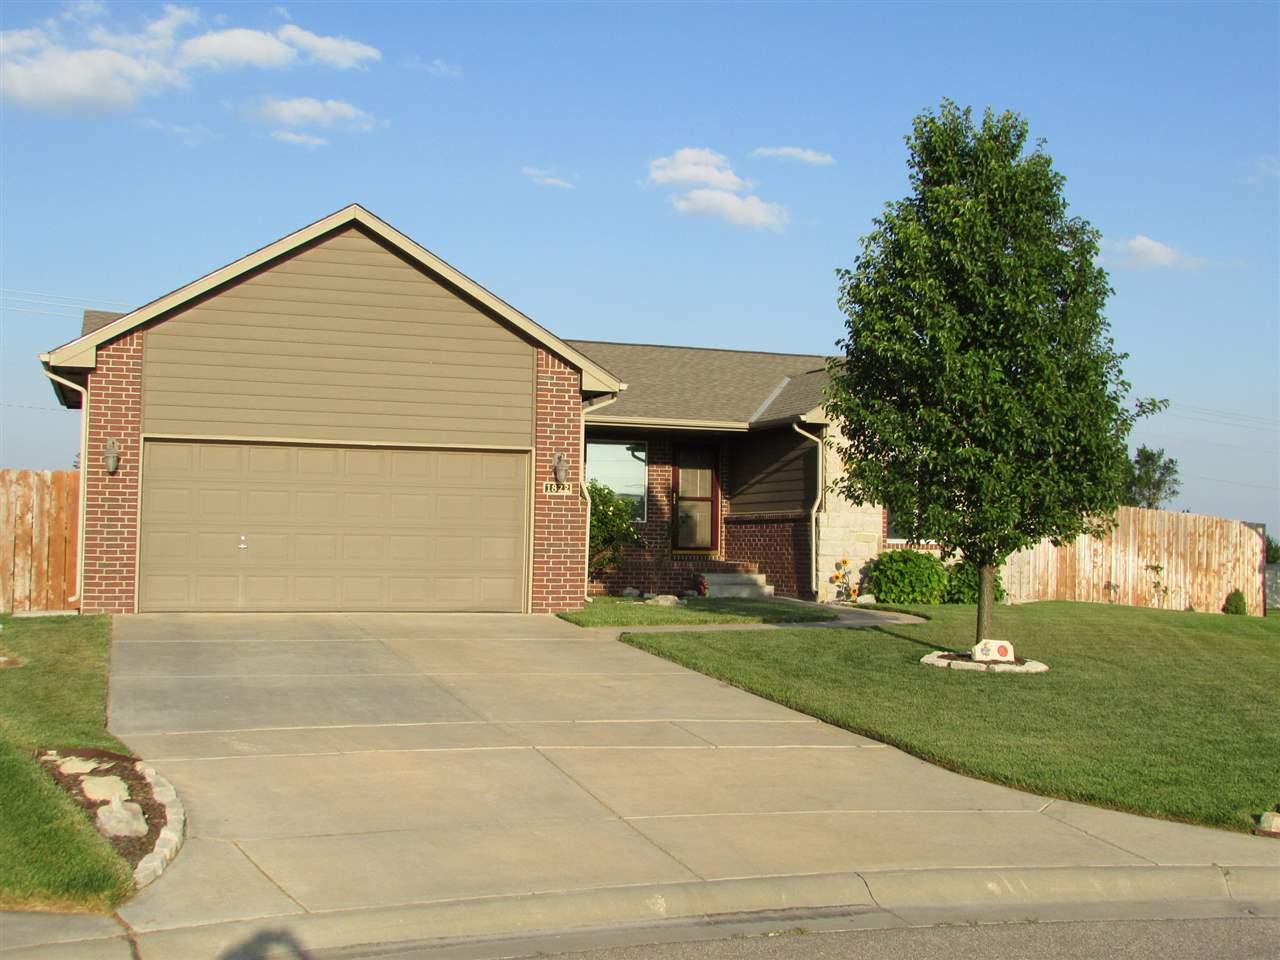 1822 N Nickelton, Wichita, KS 67235